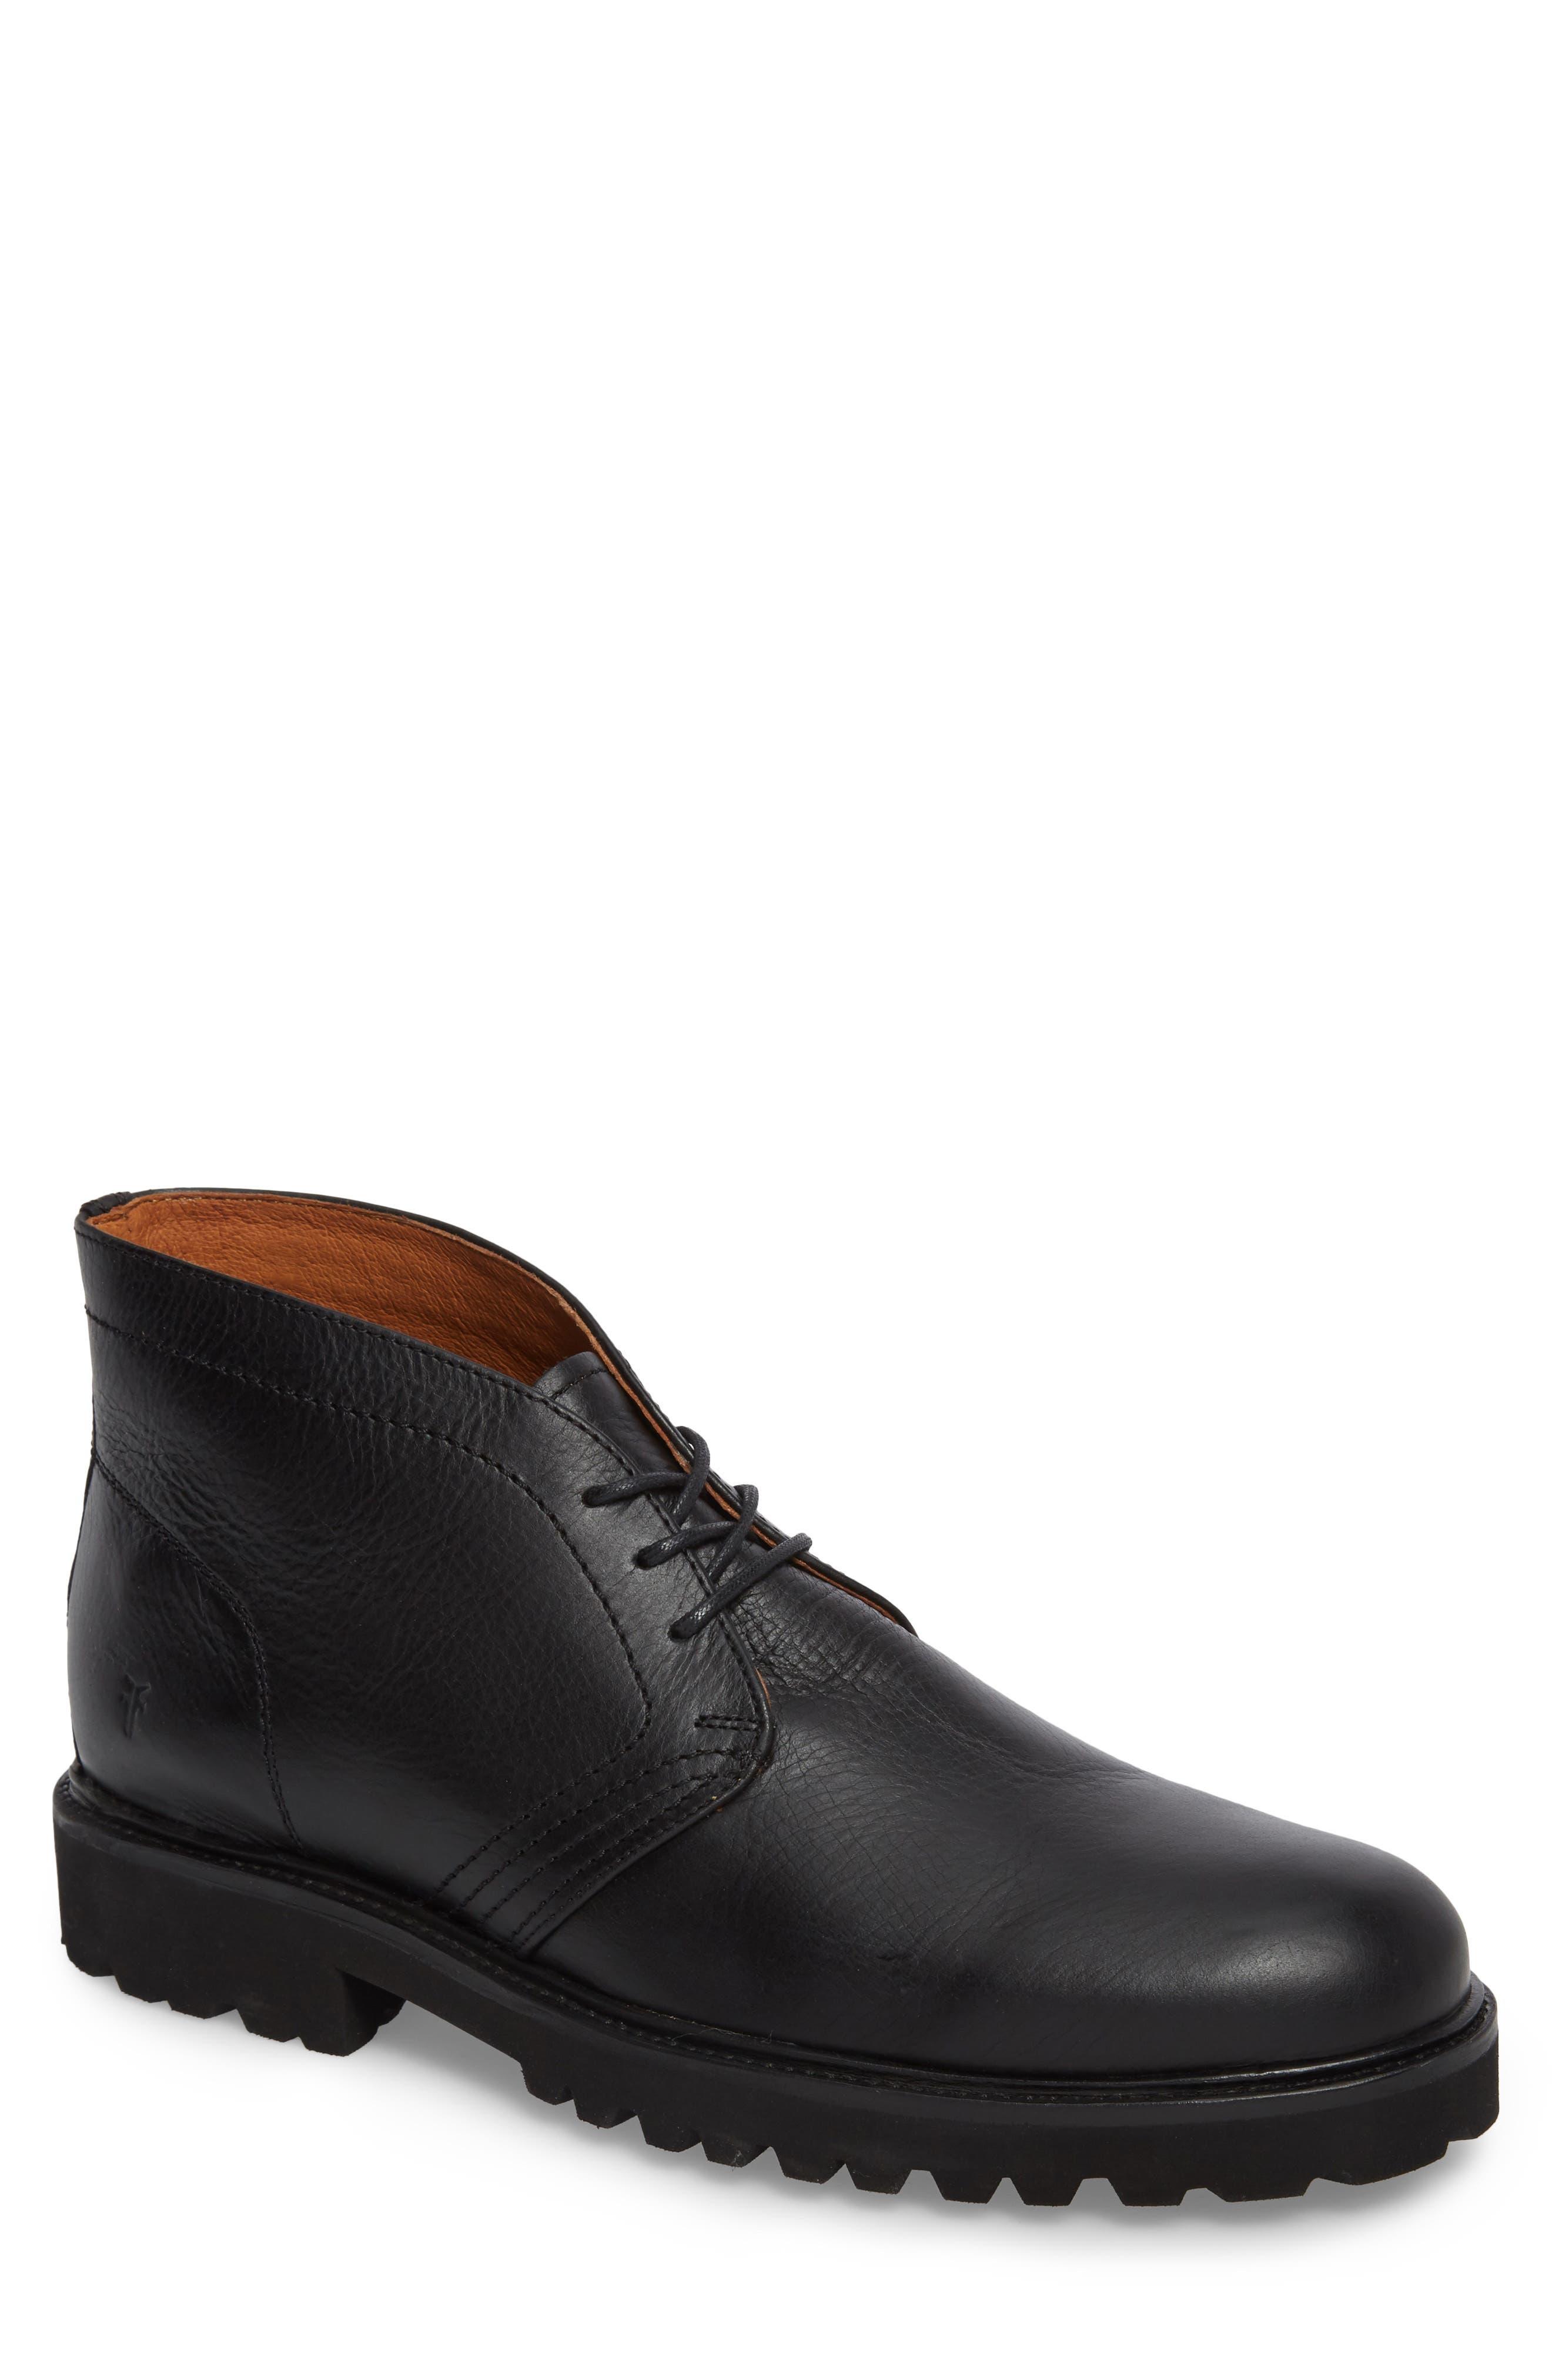 Edwin Waterproof Chukka Boot,                         Main,                         color, 001